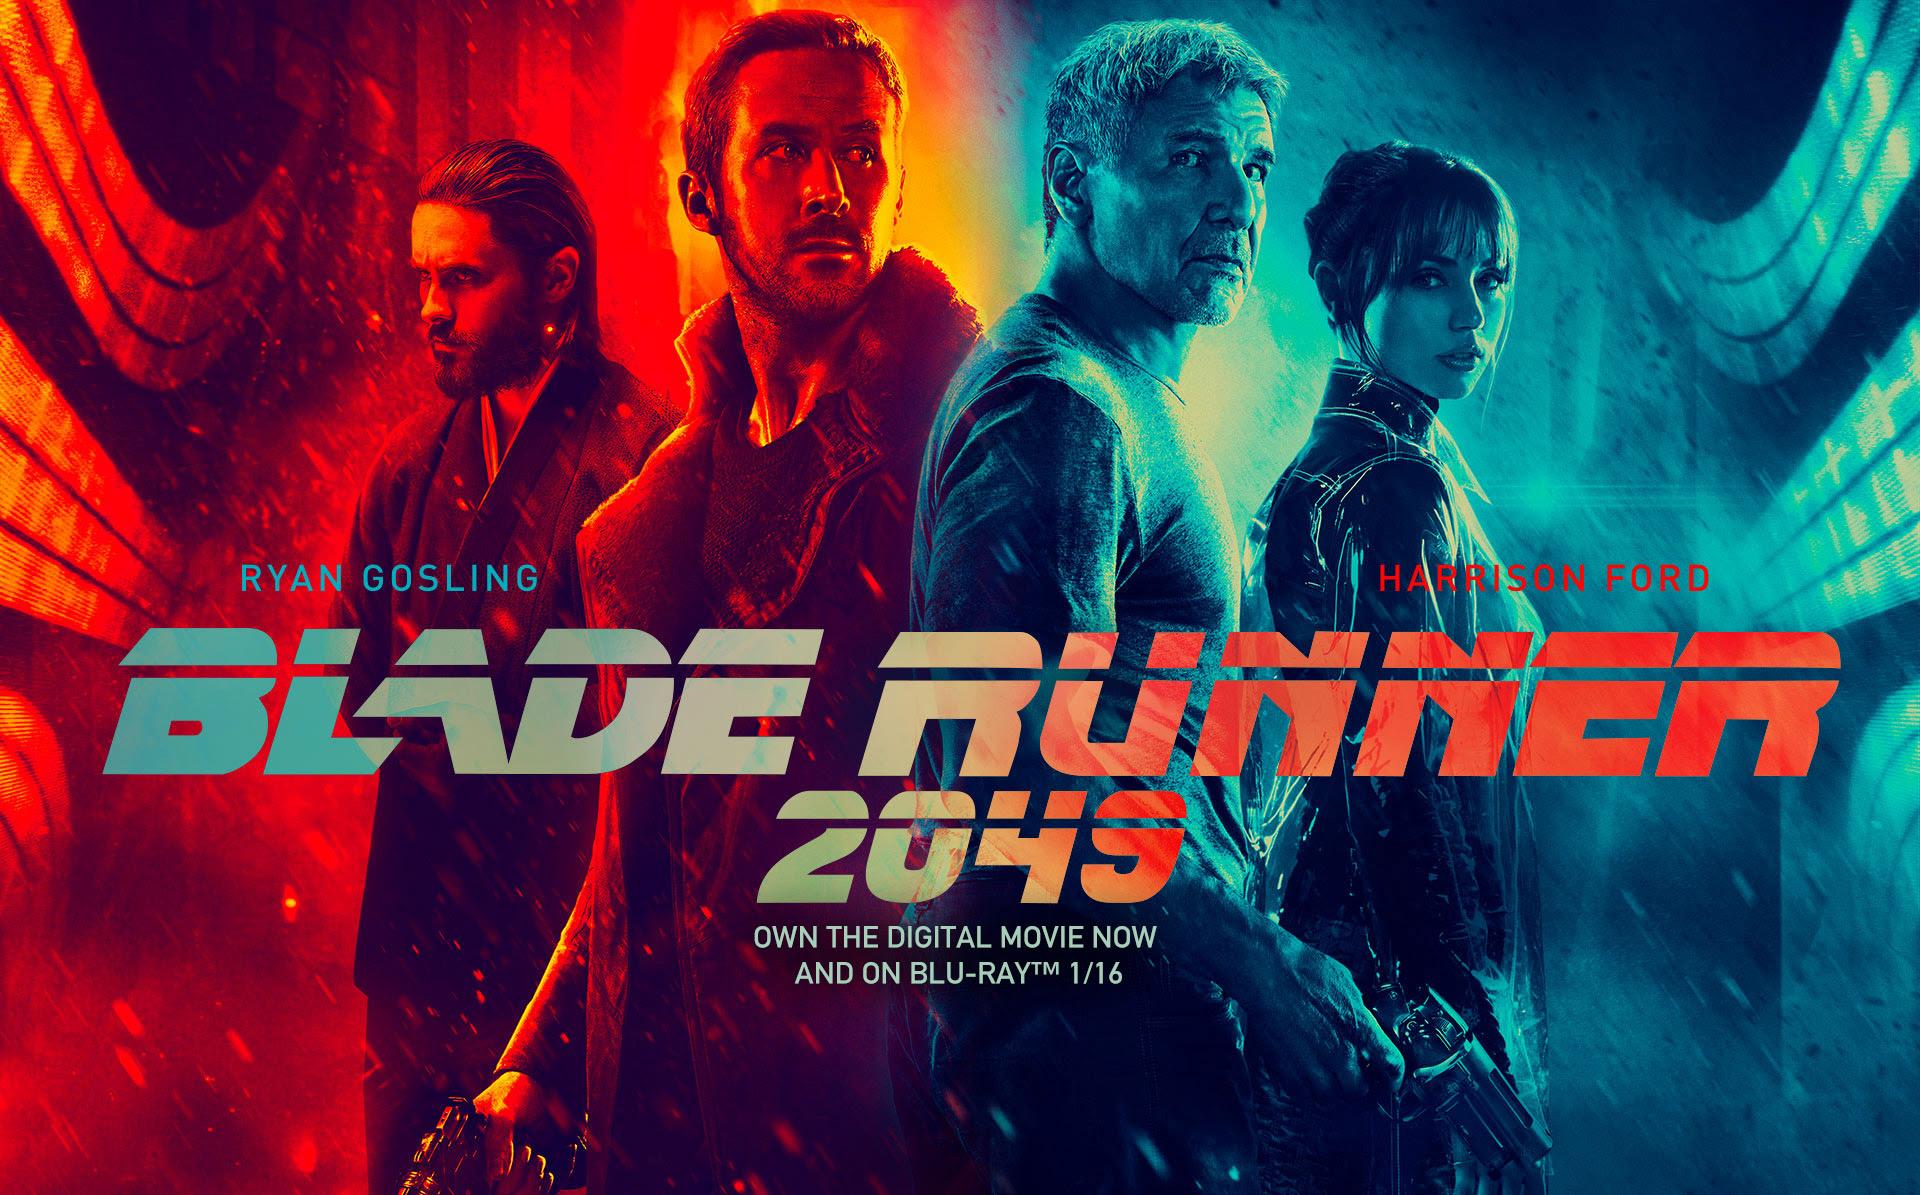 Resultado de imagem para Blade Runner 2049 posters